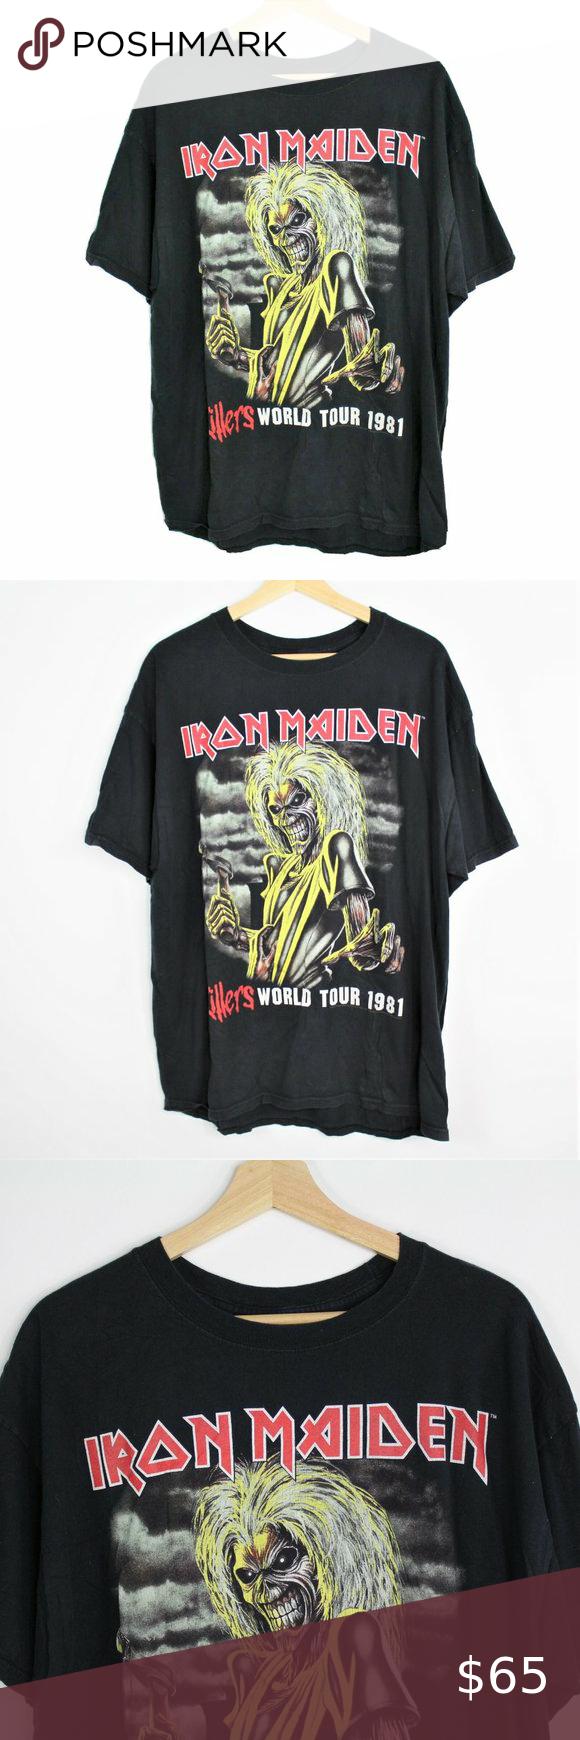 Vintage Hanes Iron Maiden Killers World Tour 1981 Vintage Hanes Iron Maiden Killers World Tour 1981 Shirt Reprint 2006 S Clothes Design 1981 Shirt Iron Maiden